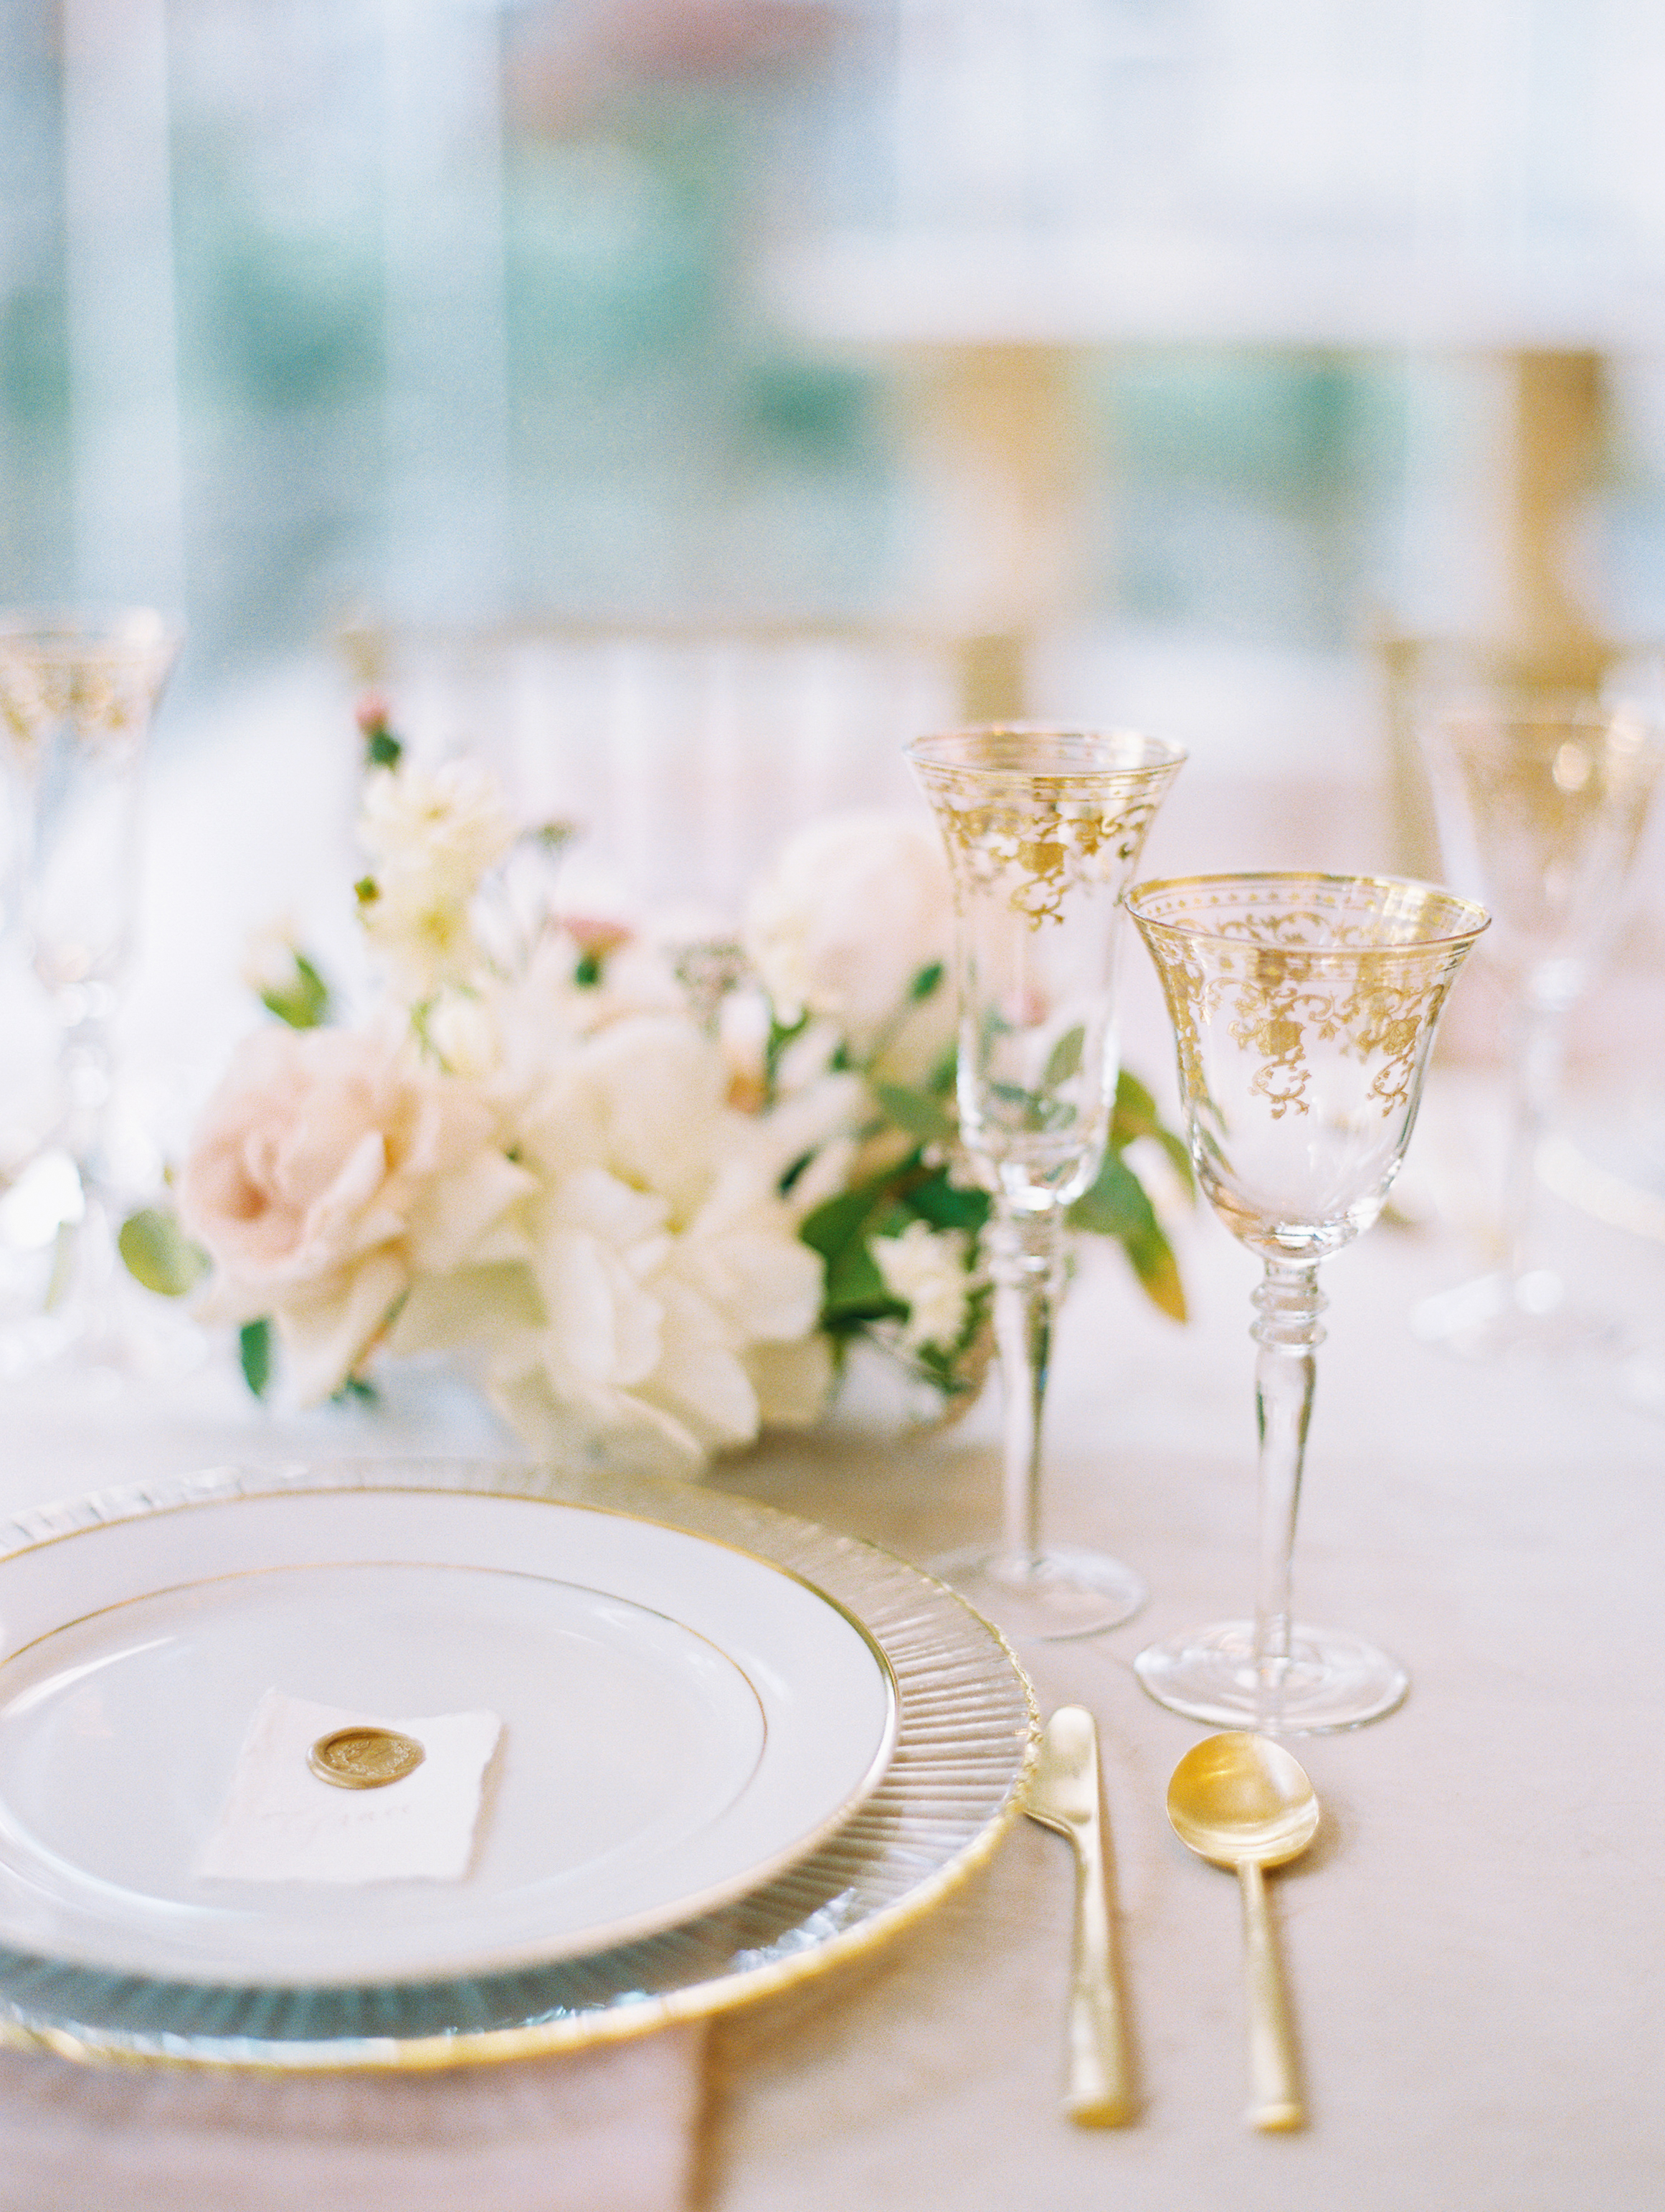 Gilded Spring Cream & Blush Wedding Inspiration - Lindsey Brunk